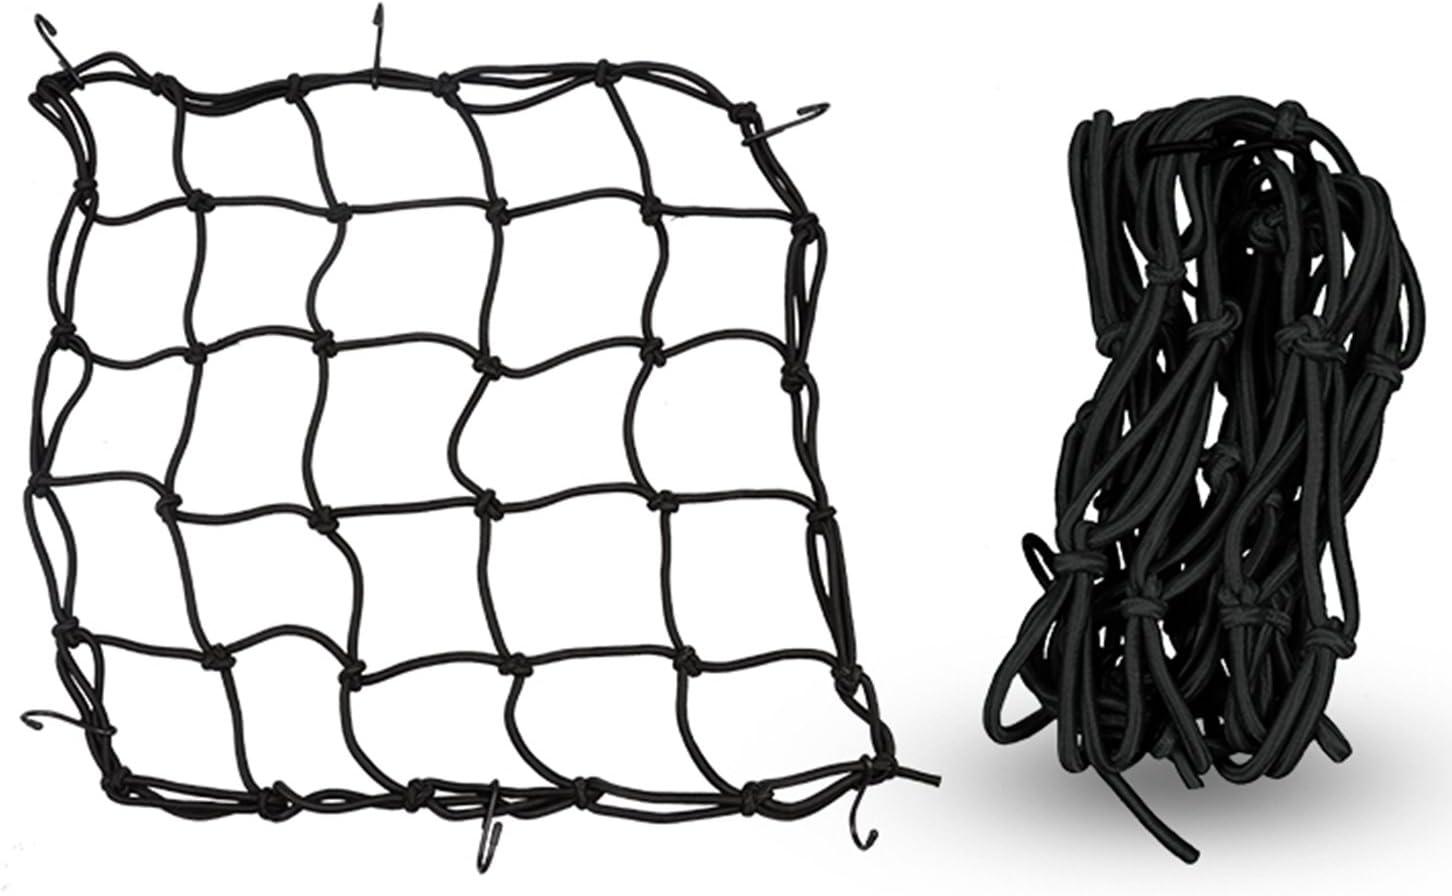 OOFIT 12/'/' X 12/'/' Cargo Net for Motorcycle Bike Luggage Helmet Storage Holder Bungee Mesh Package Carrier with 6 Adjustable Hooks Black